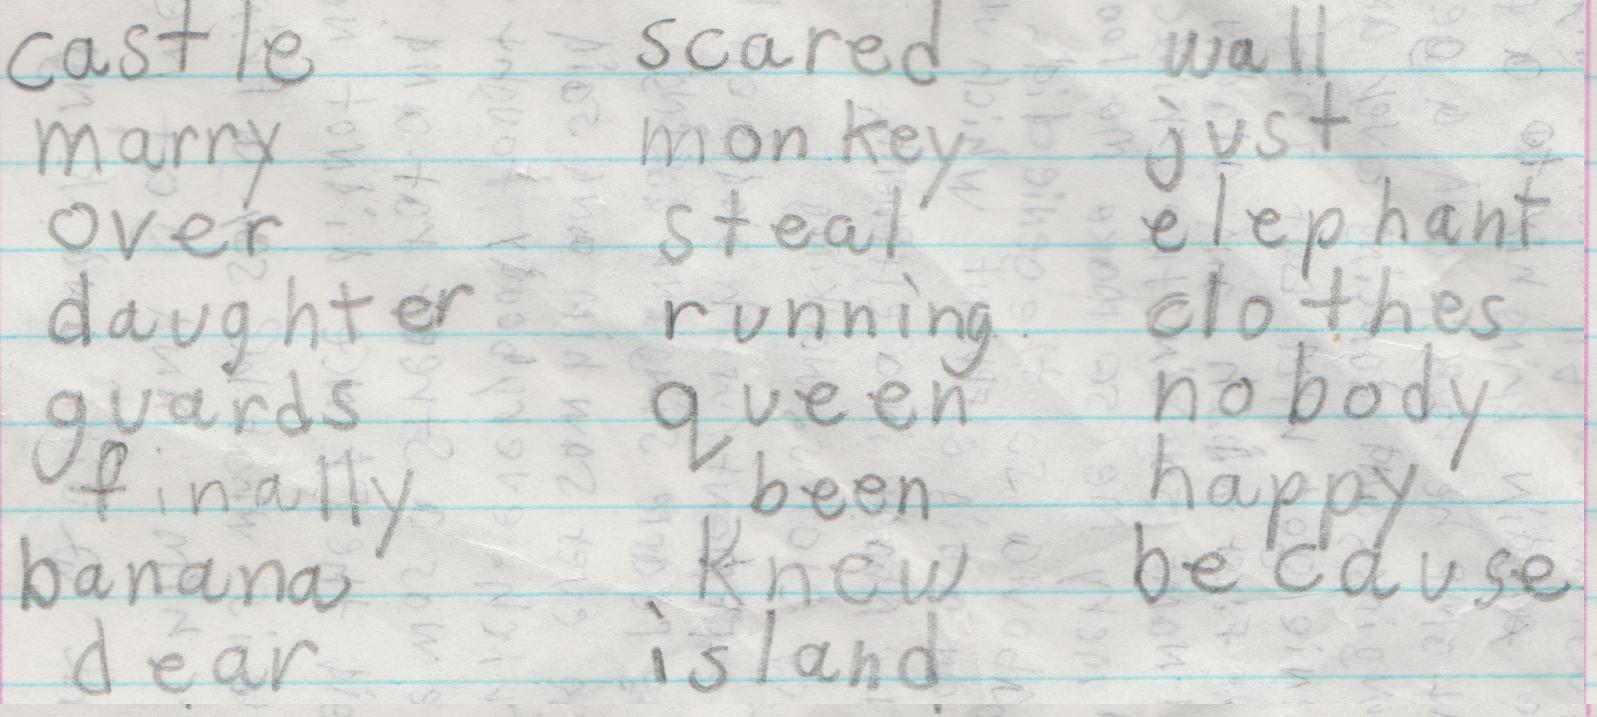 1995 maybe - spelling 2020-06-17.jpg